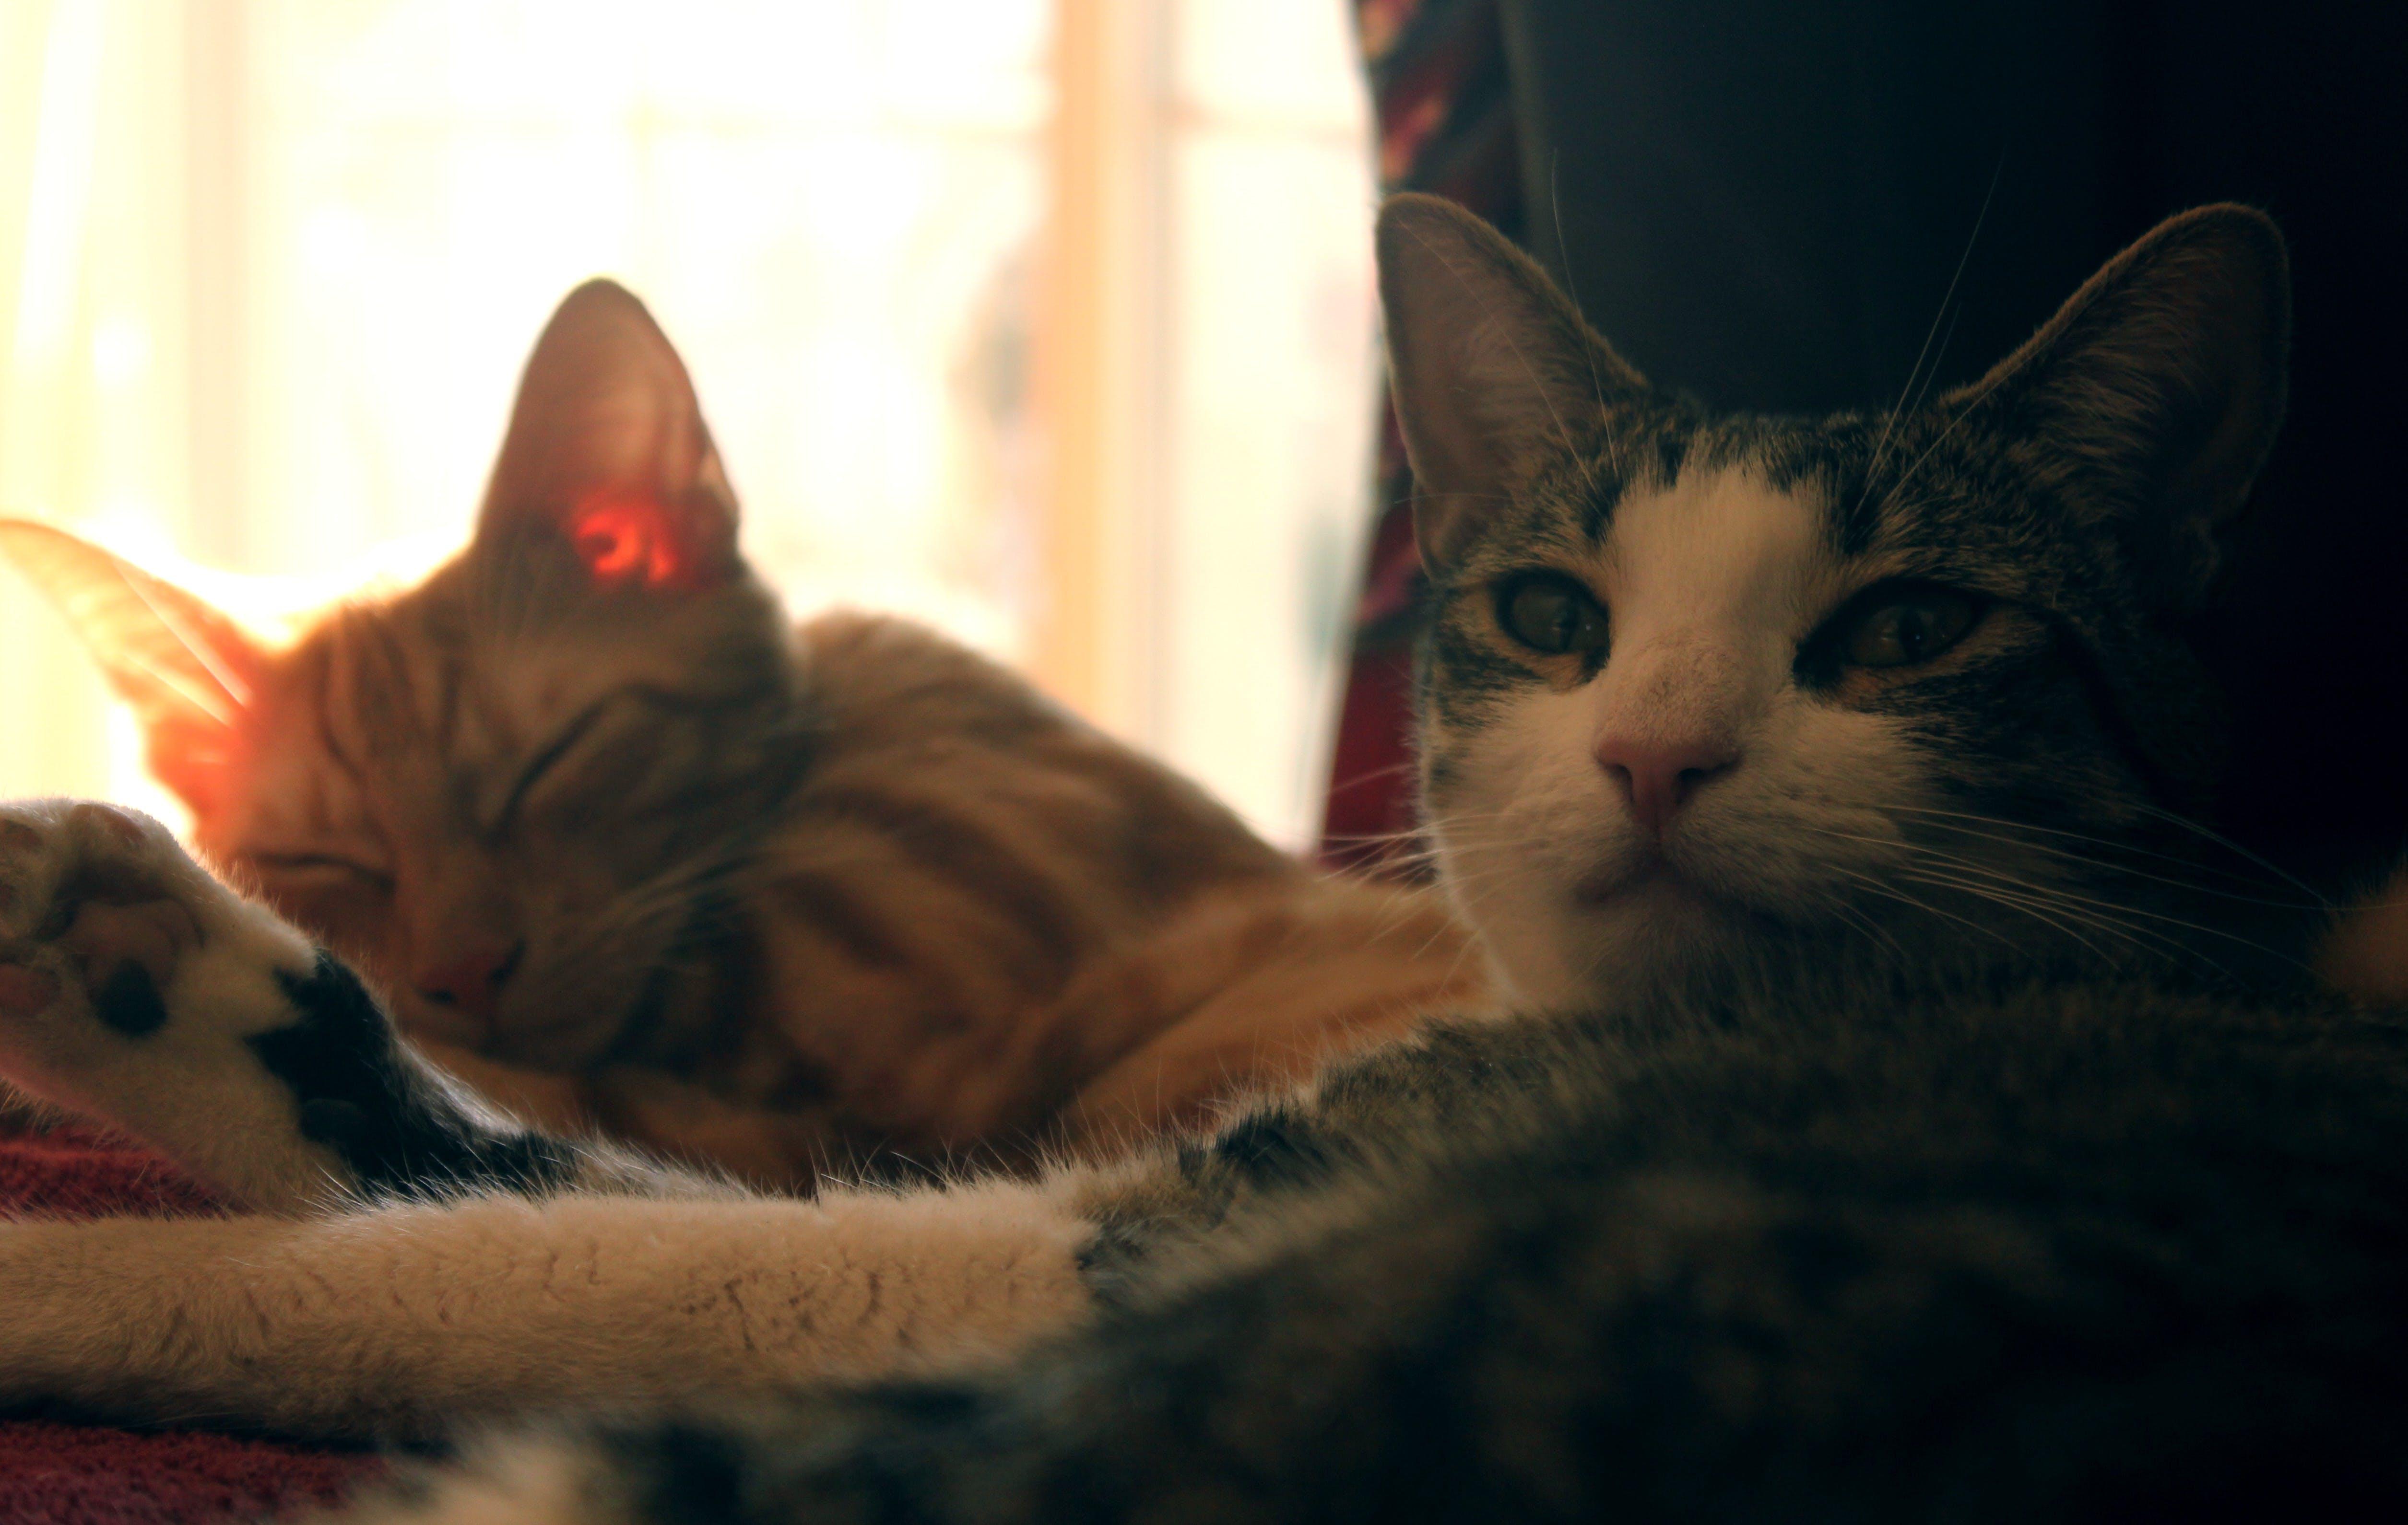 Two Orange and Gray Cat